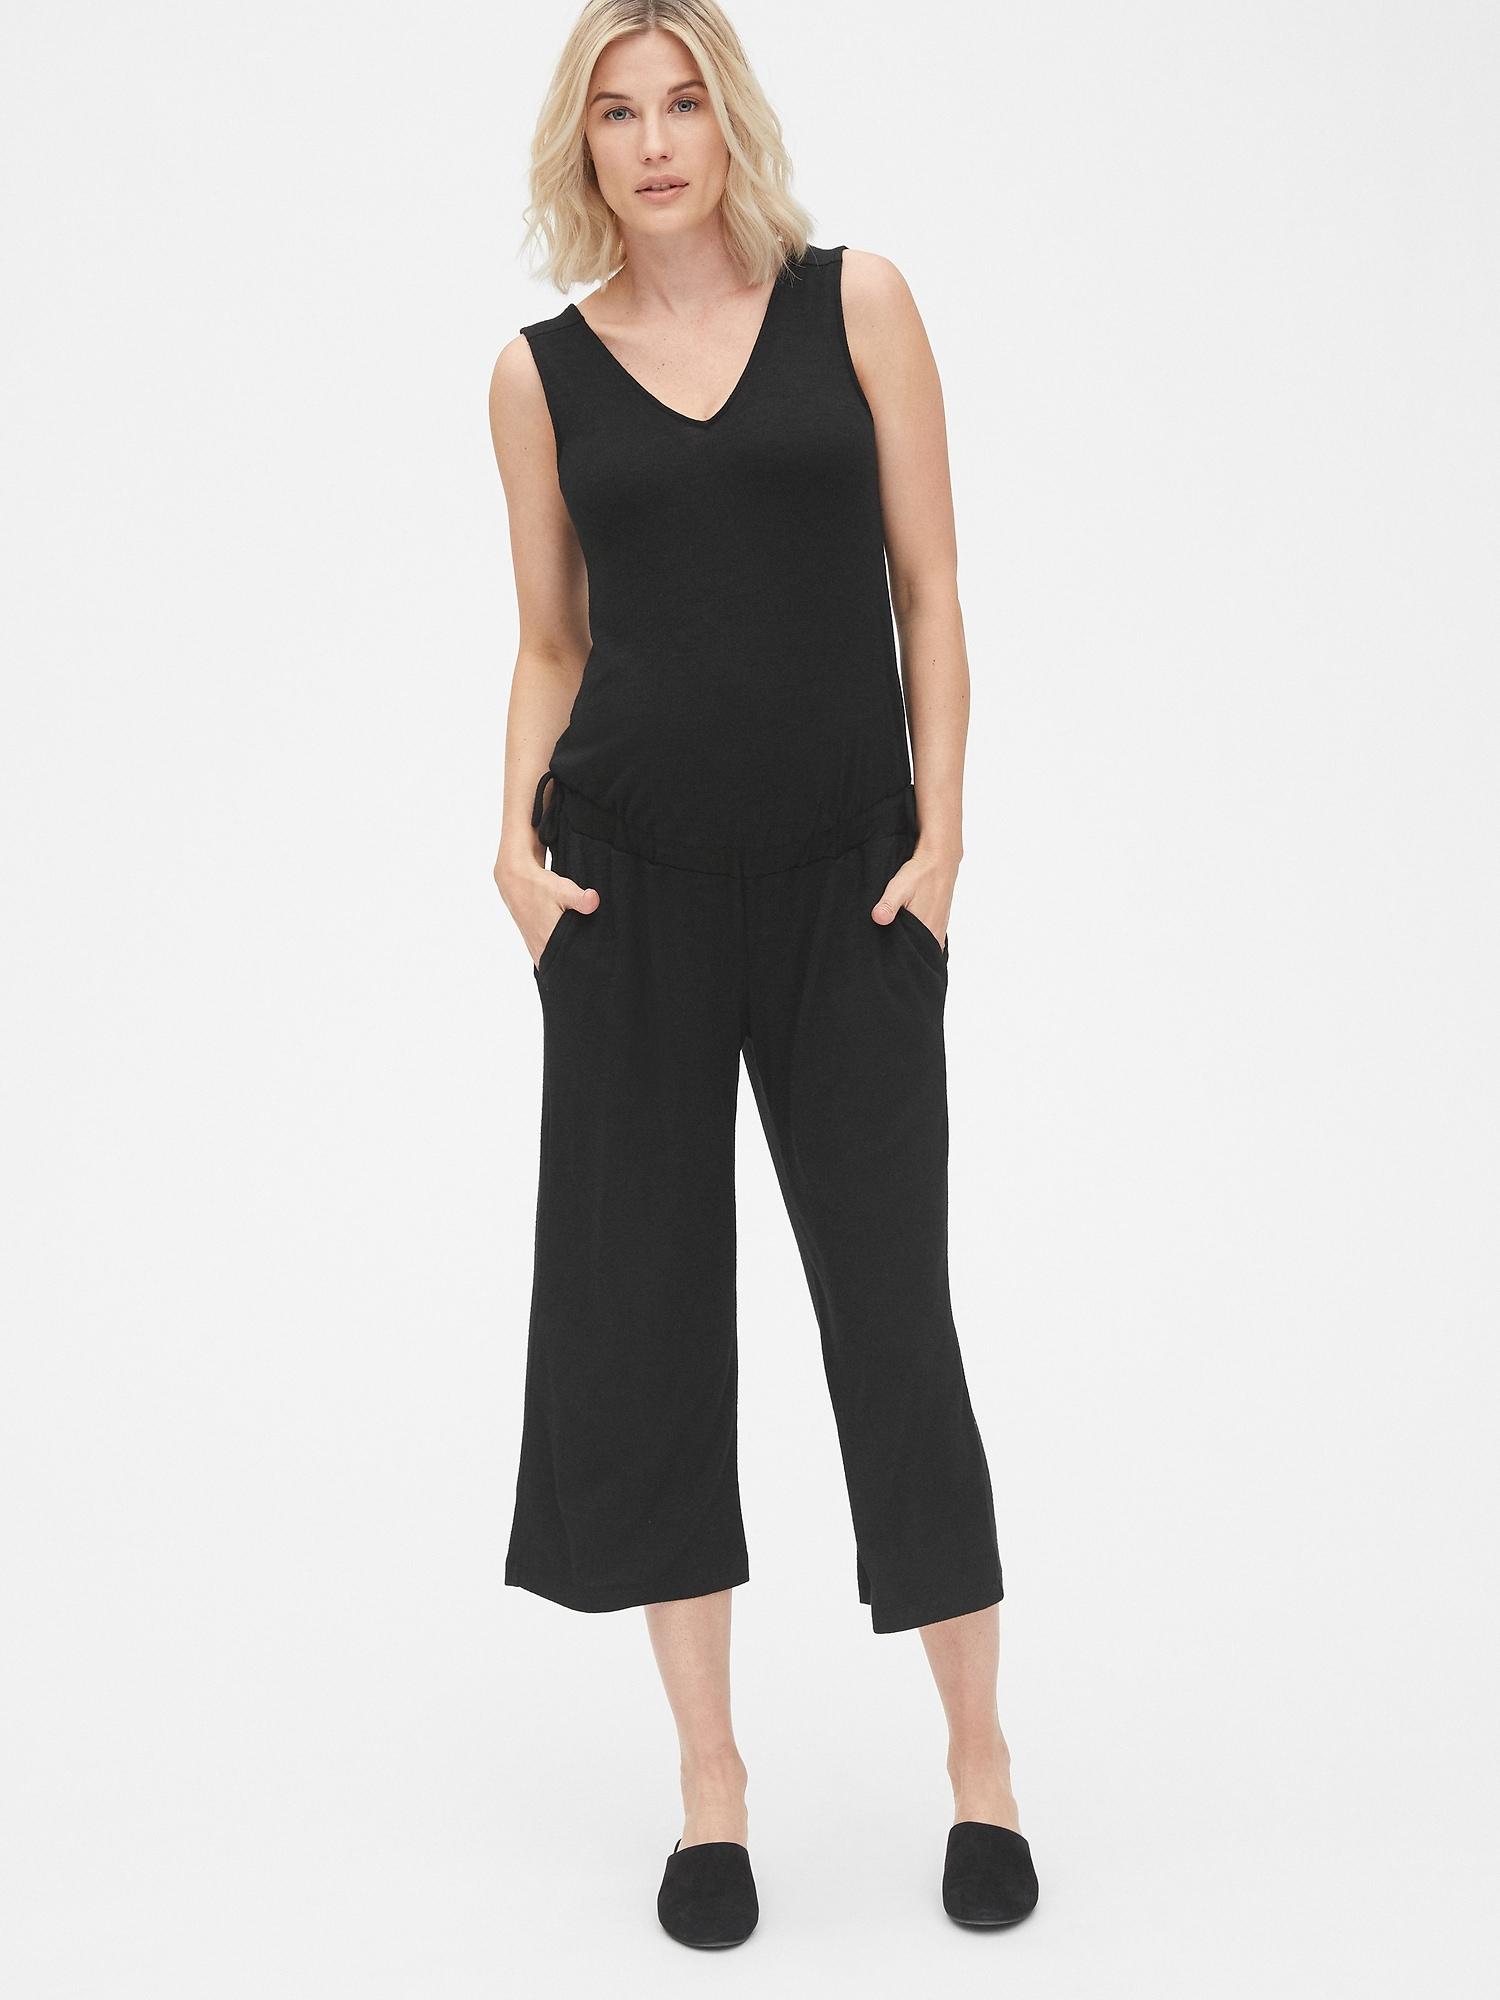 730f30e4a37a Maternity Softspun Sleeveless Tie-Waist Jumpsuit